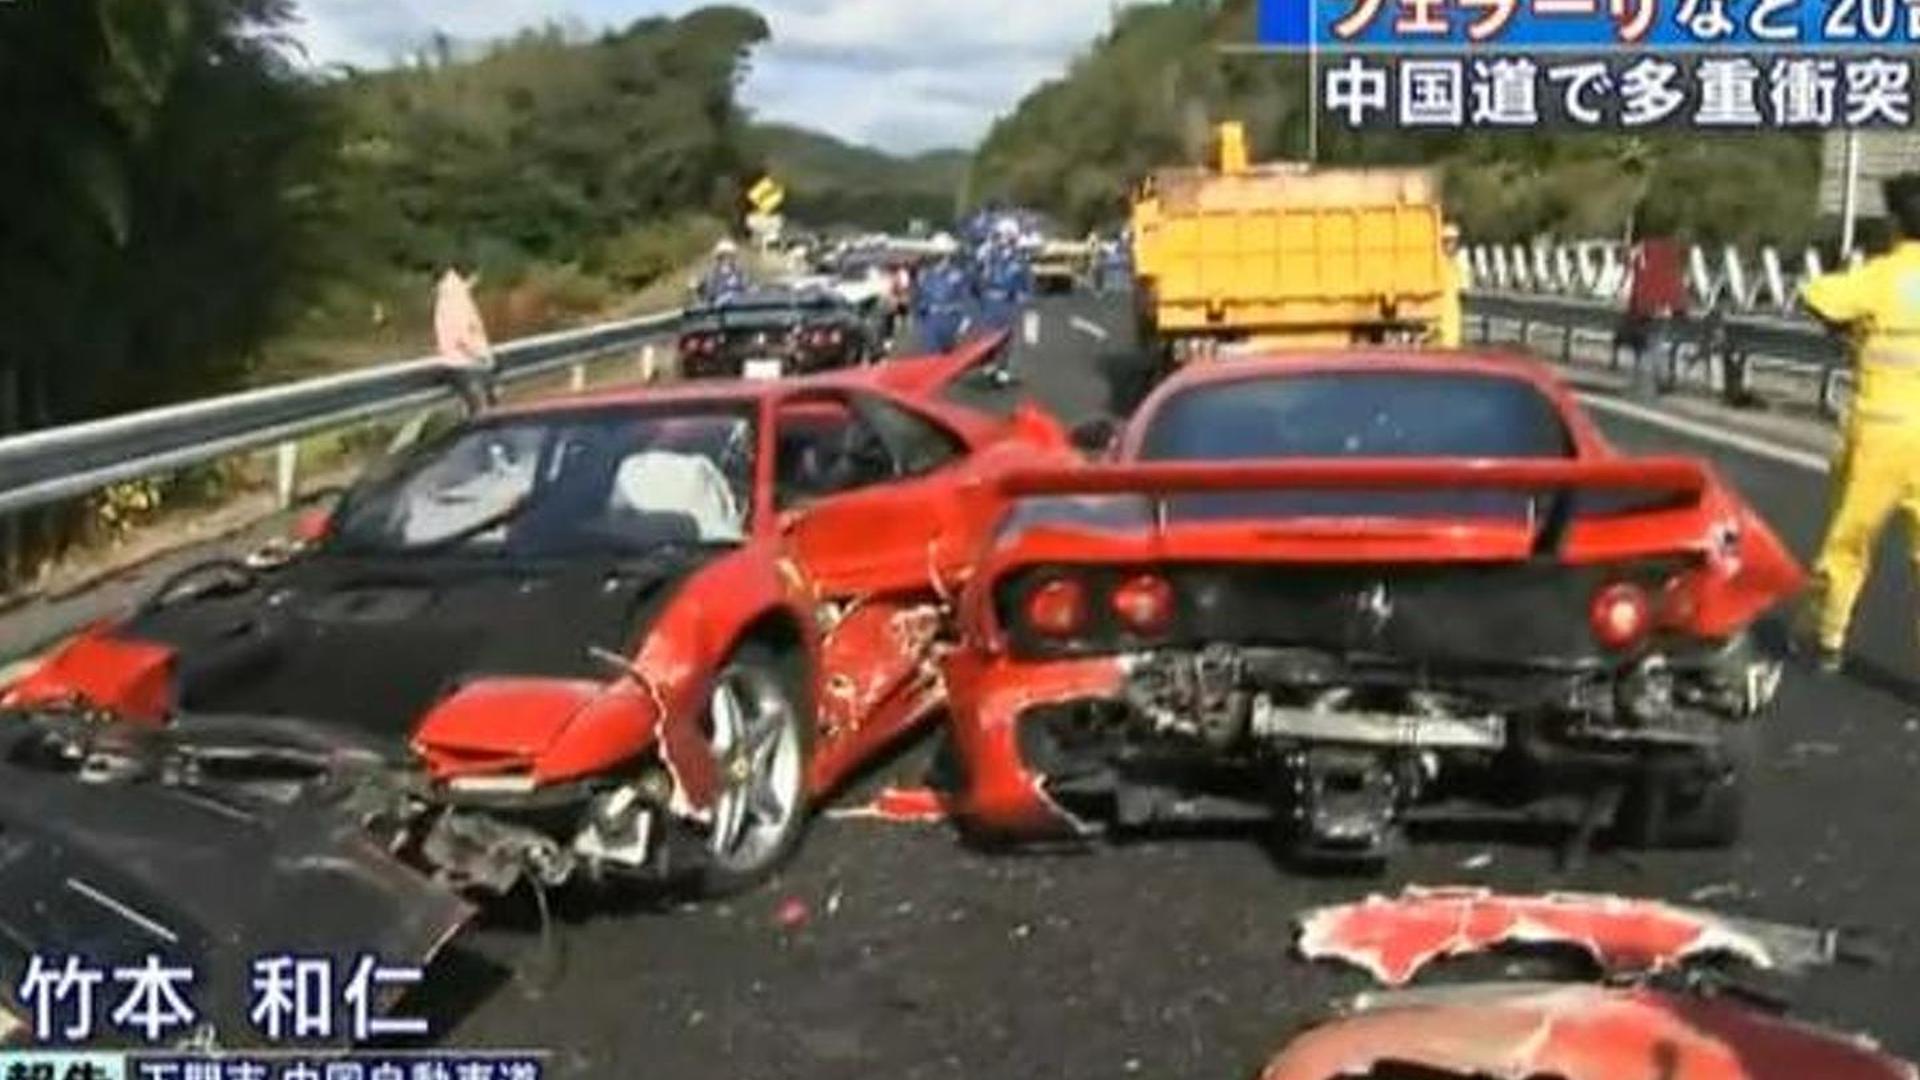 Japan Car Crash Wrecks 8 Ferraris 3 Mercedes 1 Lambo